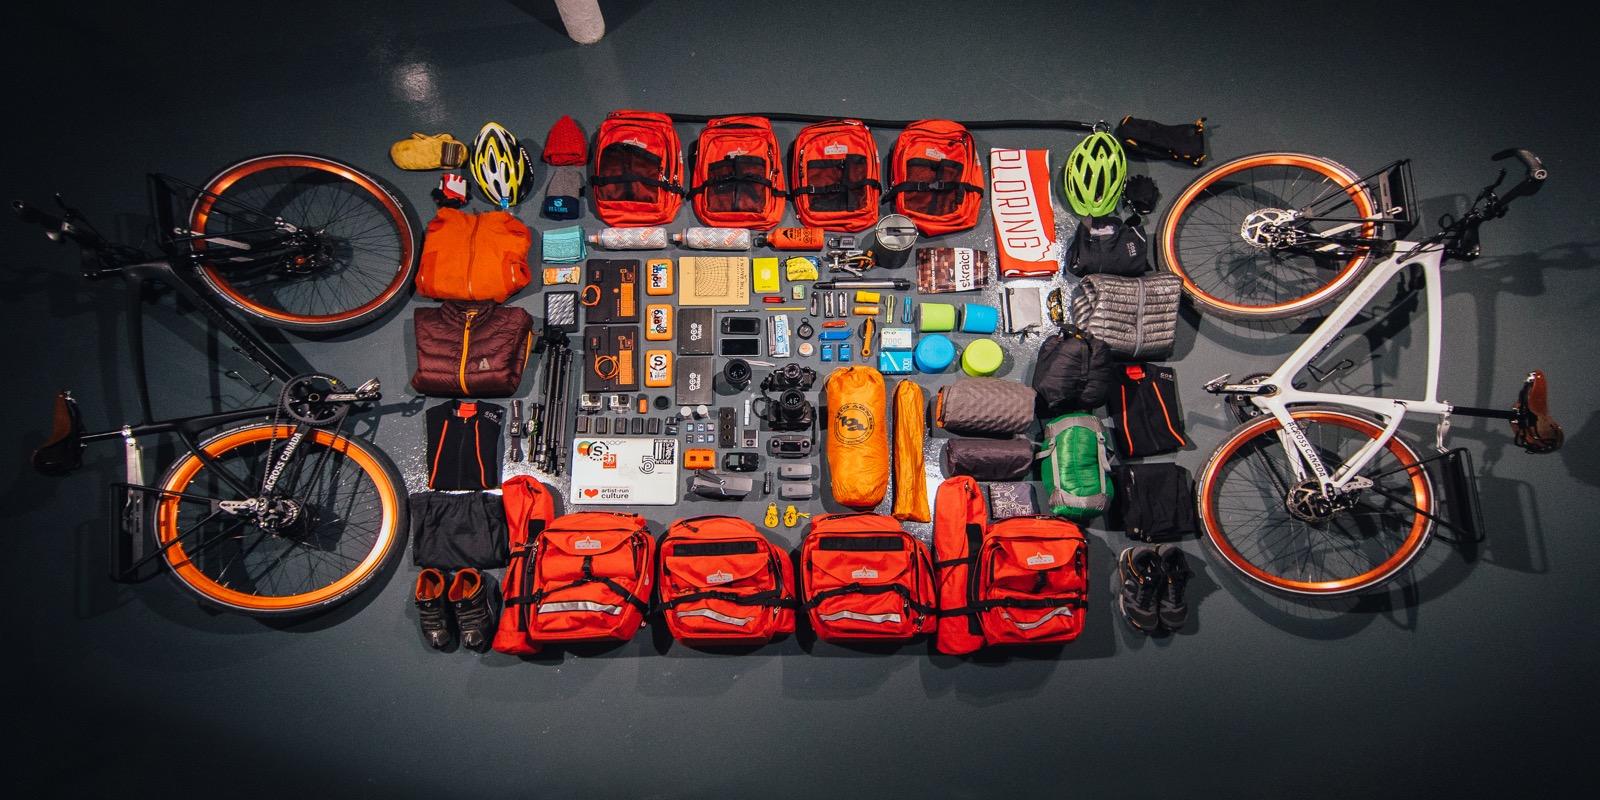 Jonathon-Reed-Asad-Chishti-Cycling-Across-Canada-Gear